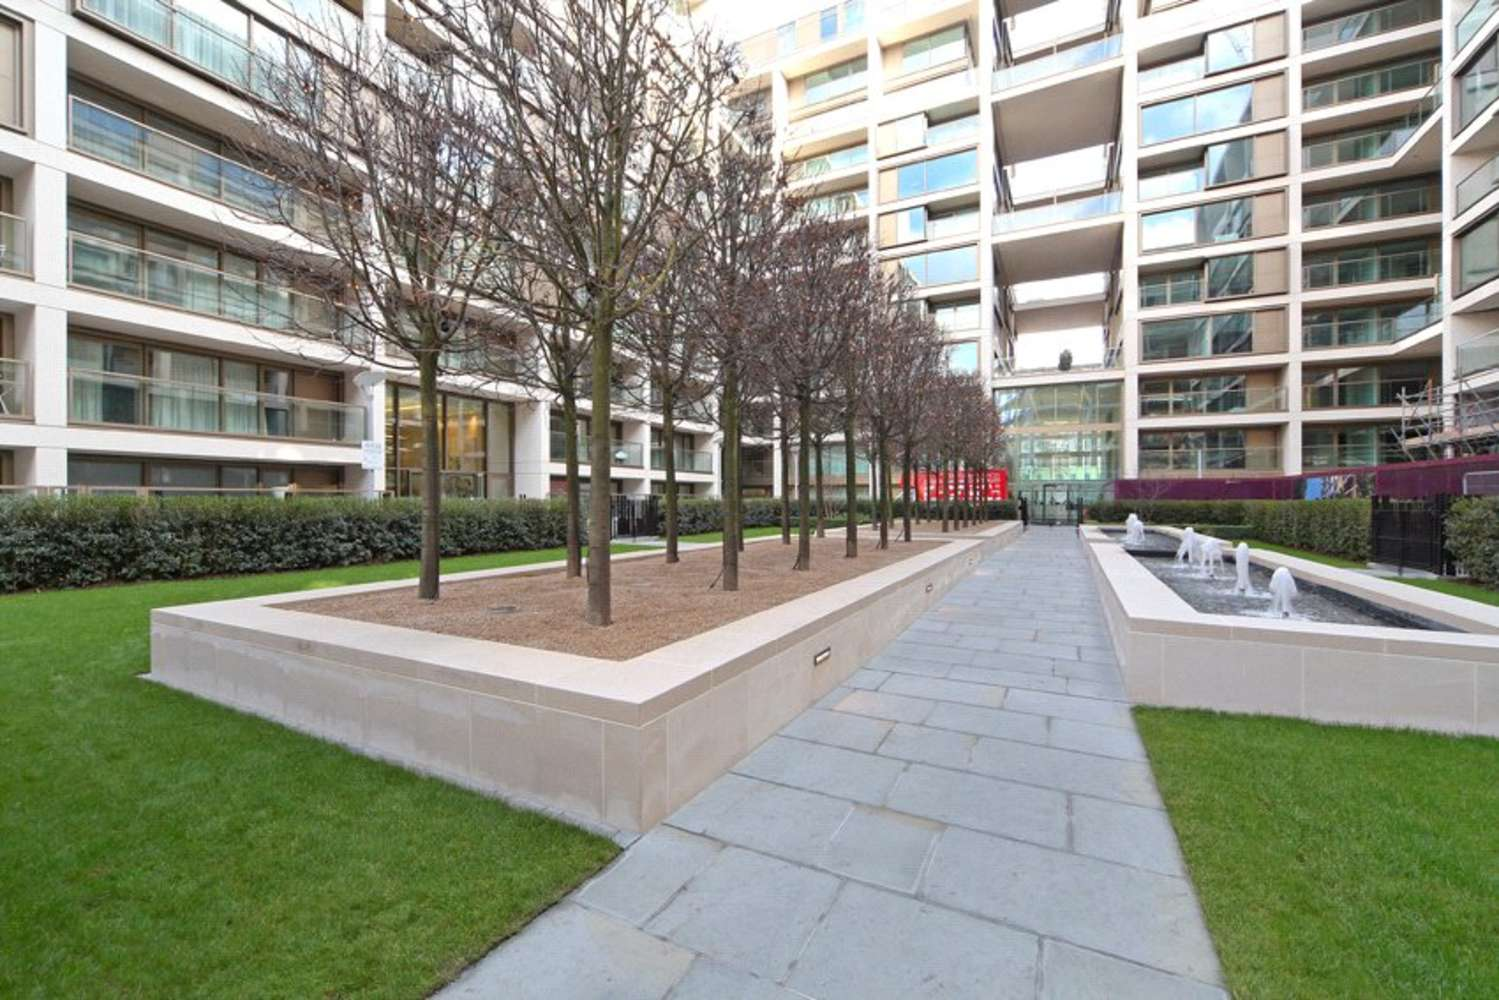 Apartment Kensington, W14 - Wolfe House 389 Kensington High Street Kensington W14 - 10